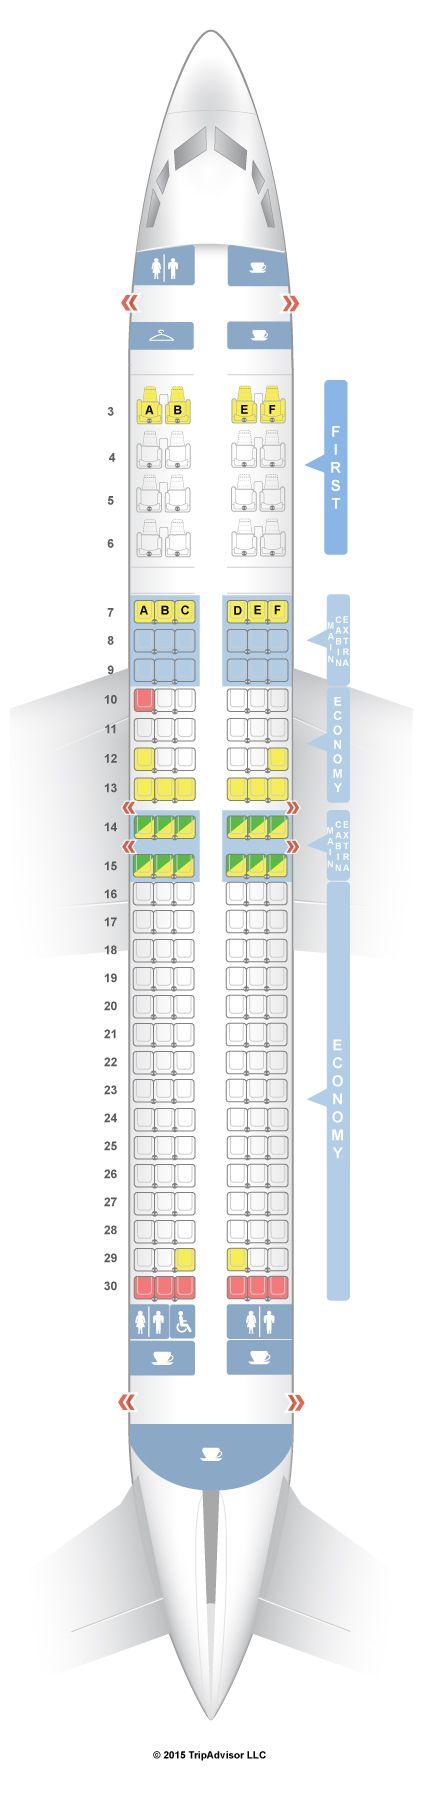 SeatGuru Seat Map American Airlines Boeing 737-800 (738) V1 - SeatGuru